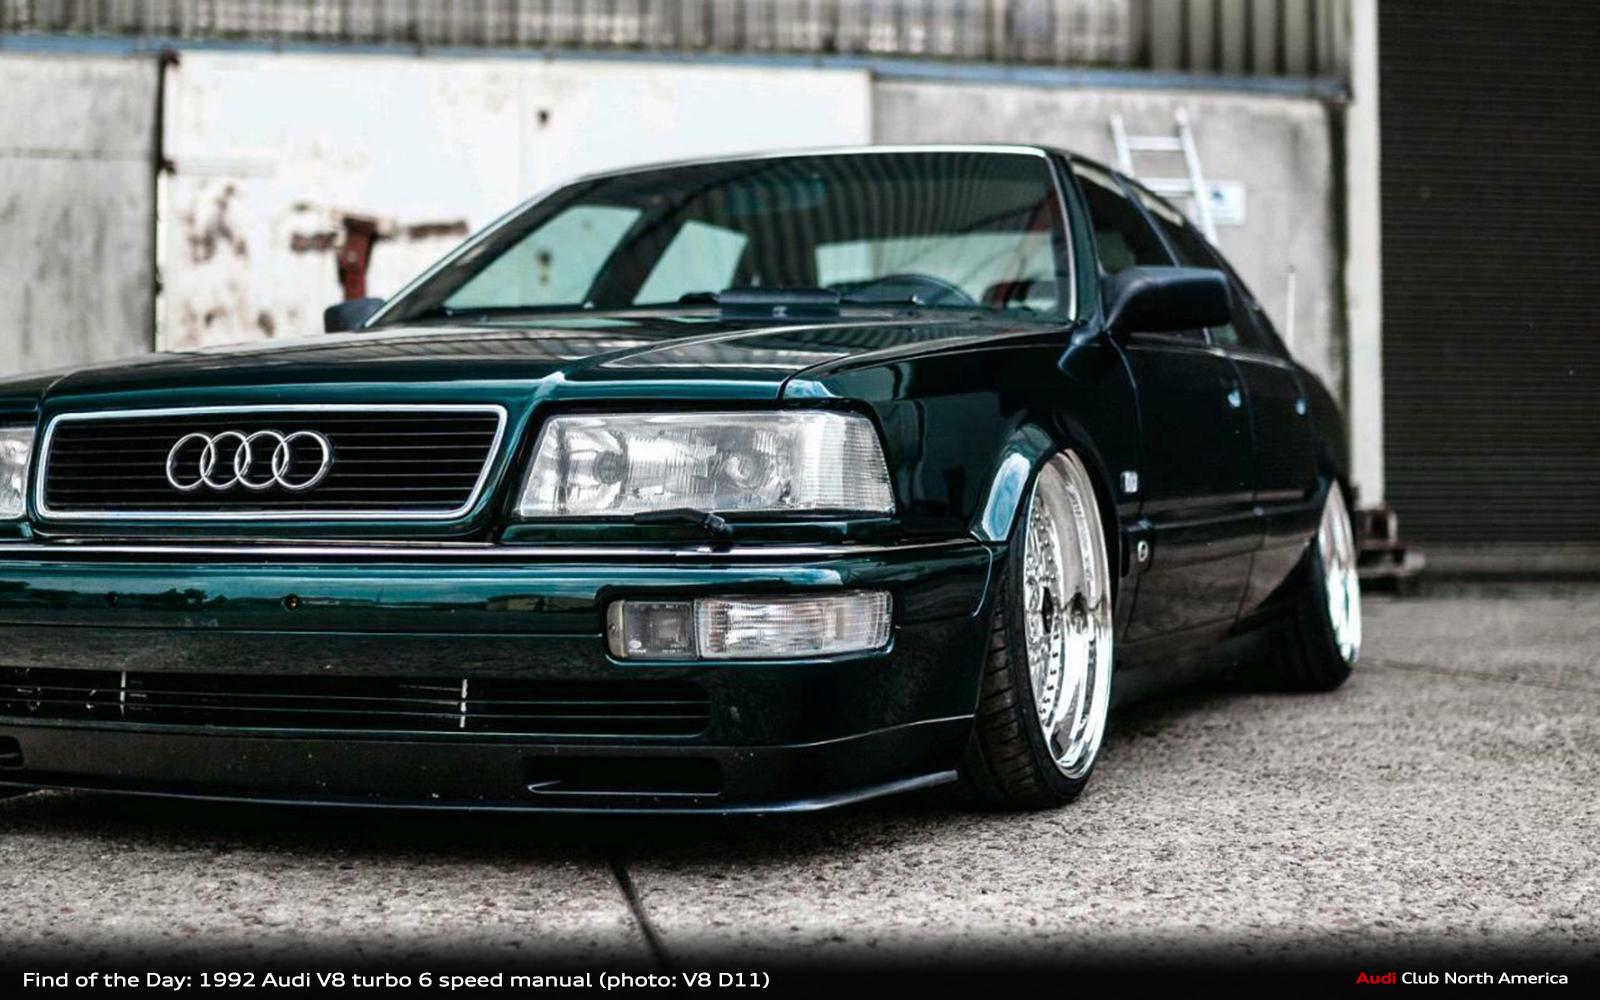 Kelebihan Audi V8 Turbo Spesifikasi